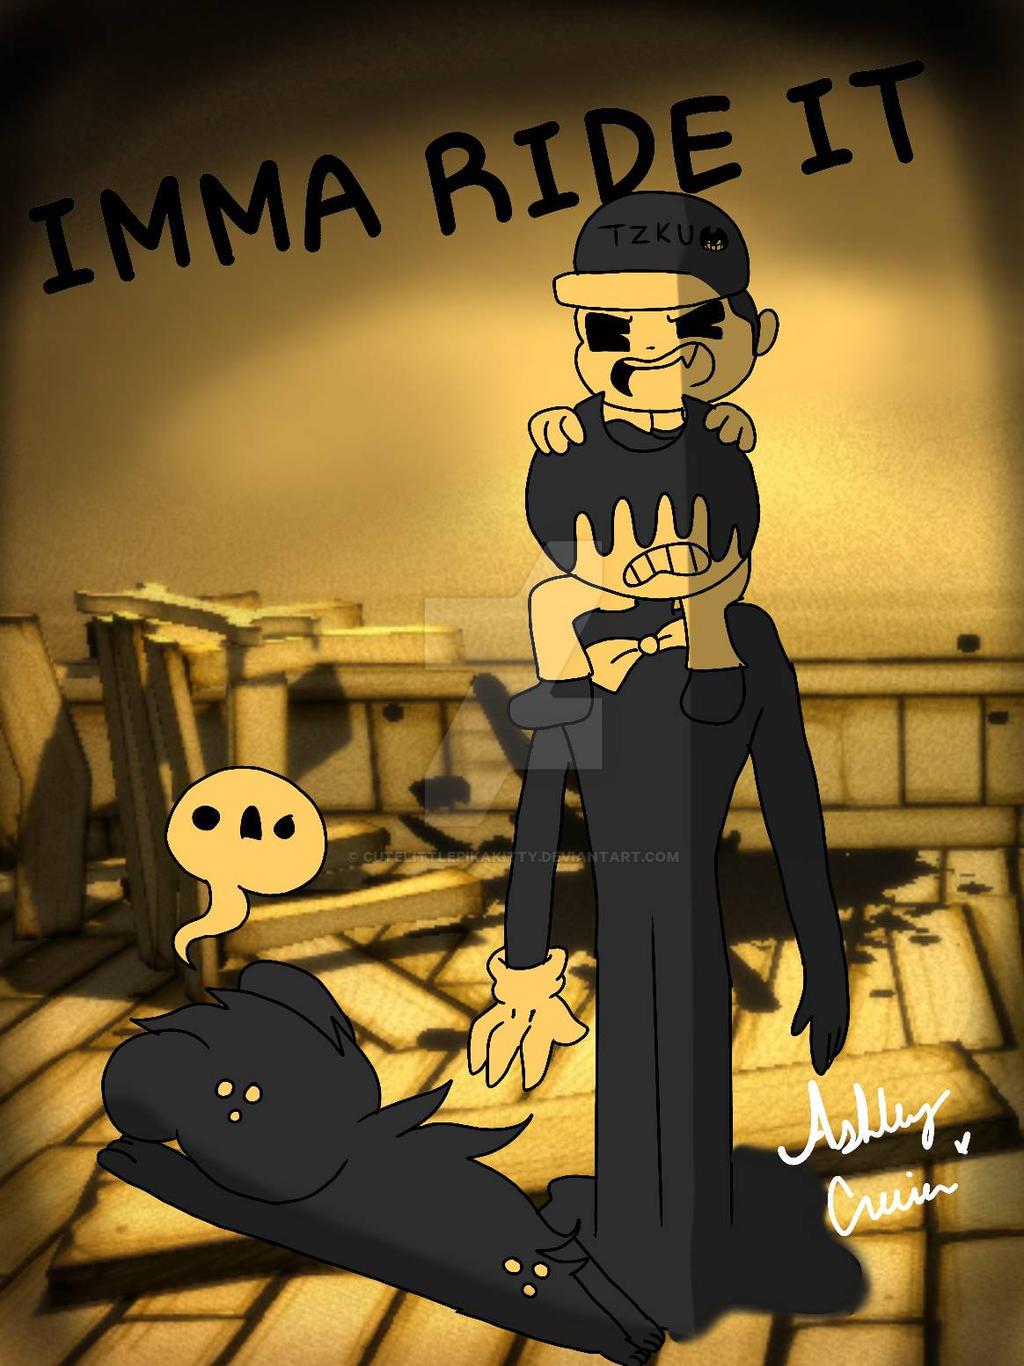 IMMA RIDE IT [No proper title lol] by cutelittlepikakitty